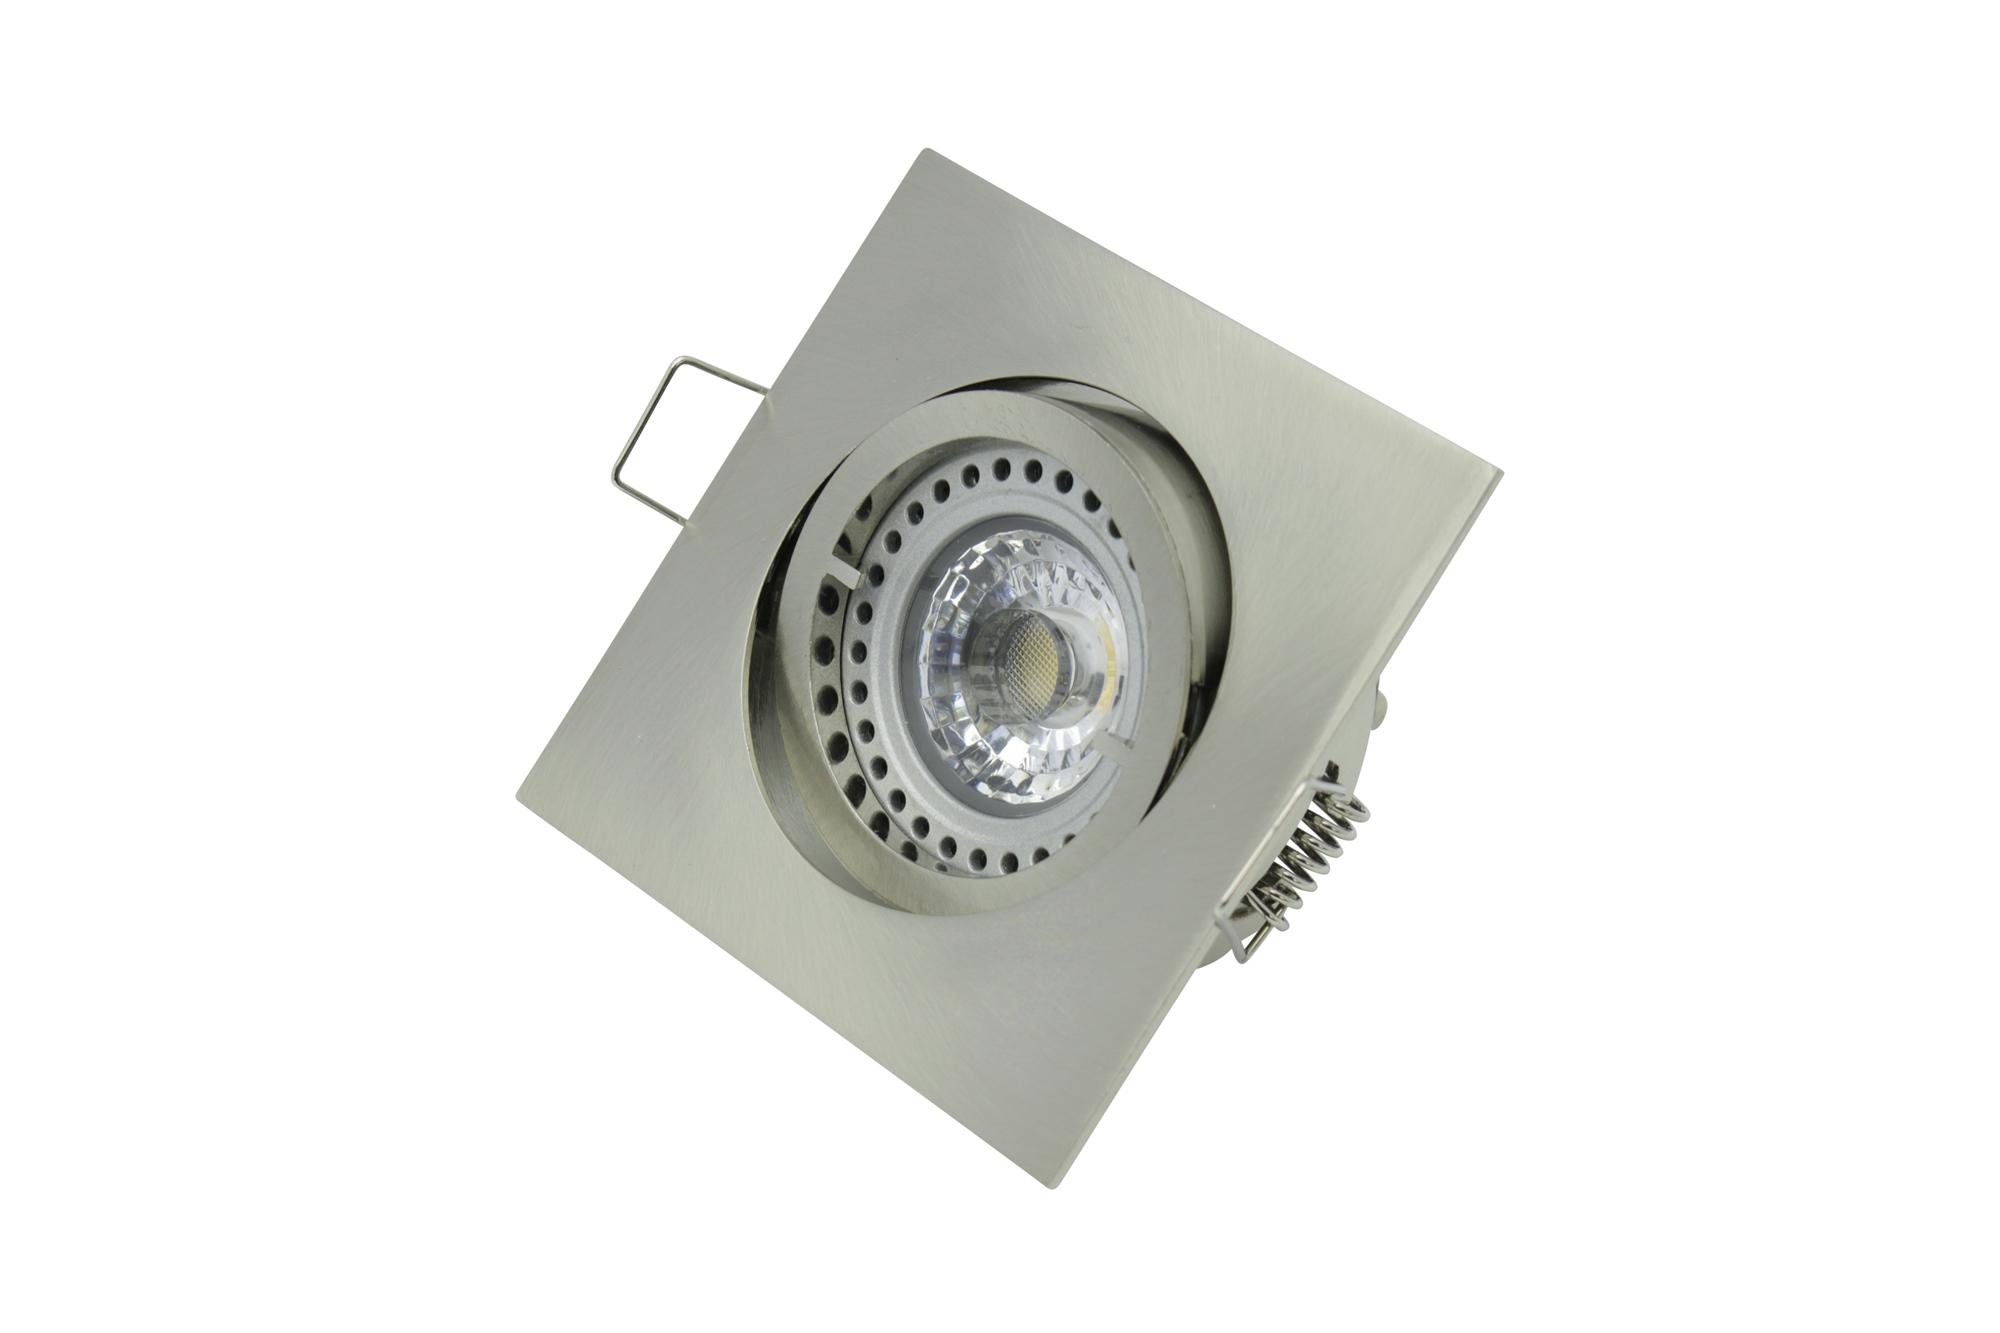 Lampenlux Einbaustrahler Spot Snap eckig Nickel gebürstet schwenkbar 8.2x8.2cm 12V rostfrei Aluminium